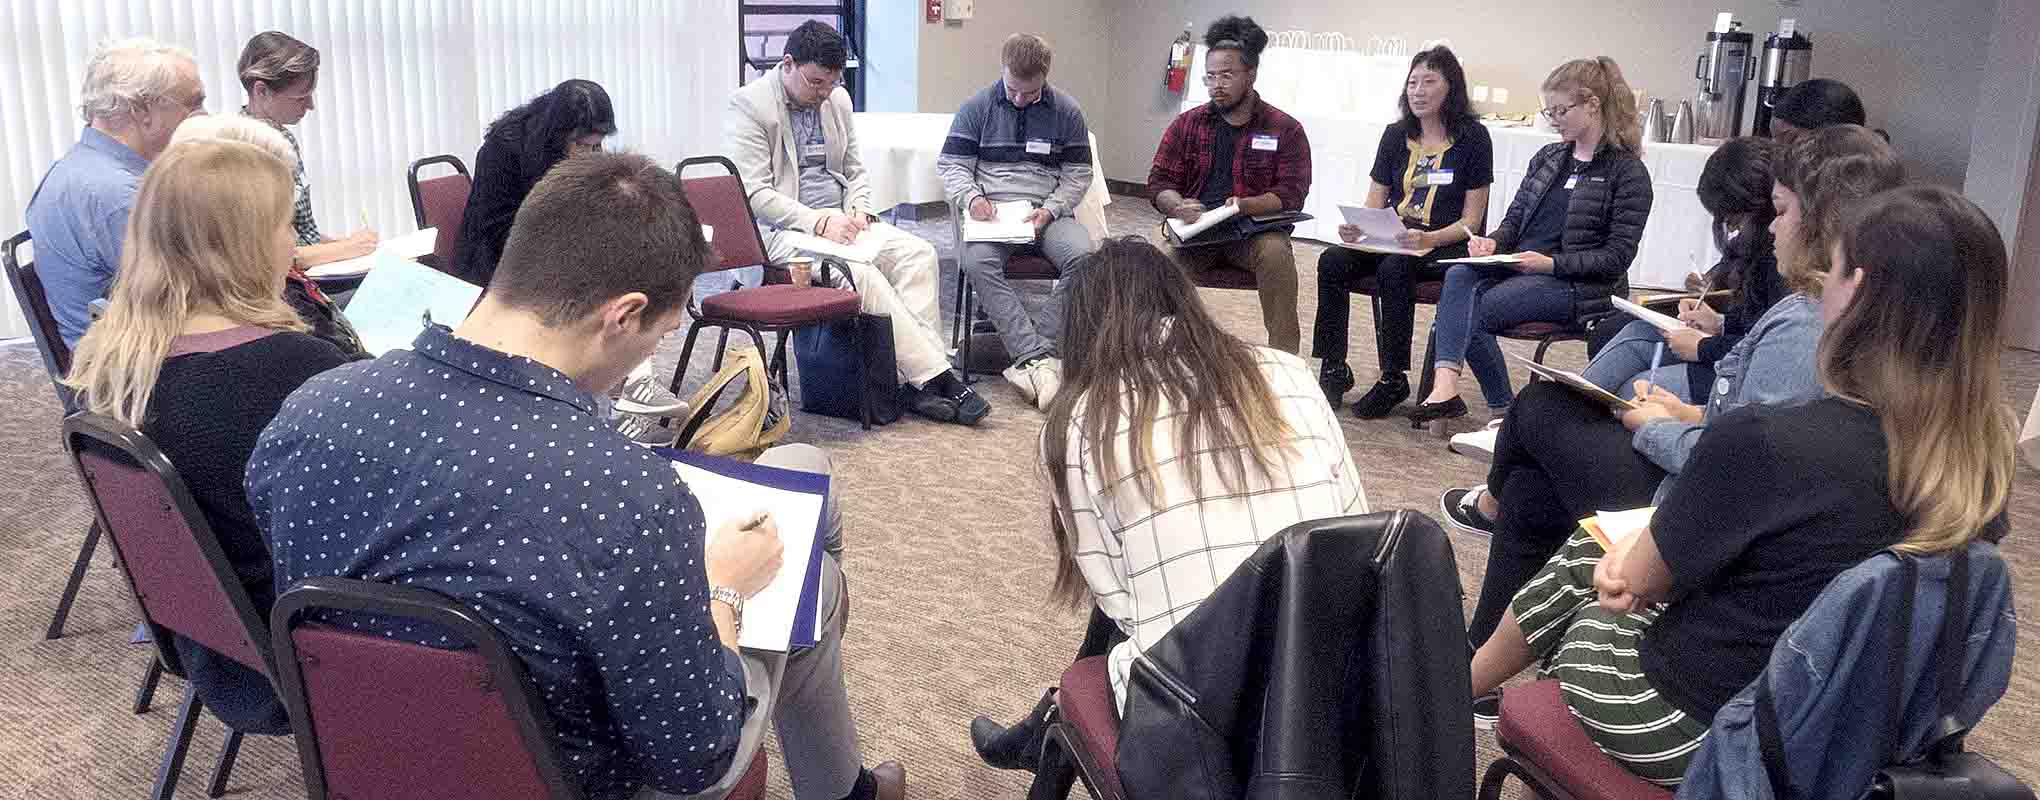 Participants of the Conflict Workshop